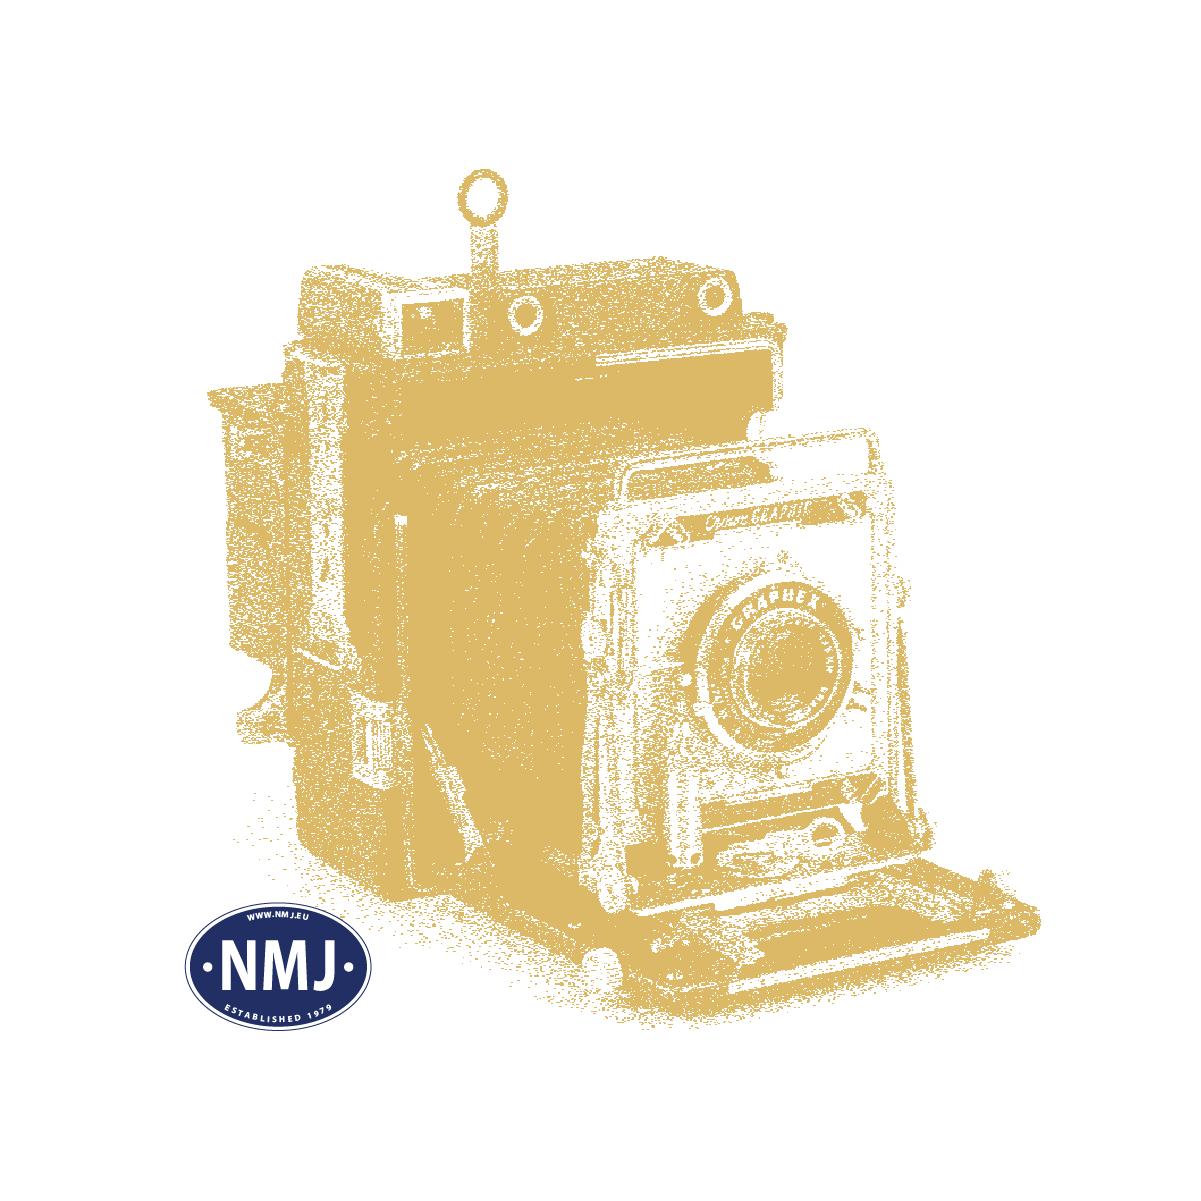 MBR55-1001 - Gressmatte #1, 30 x 40 Cm